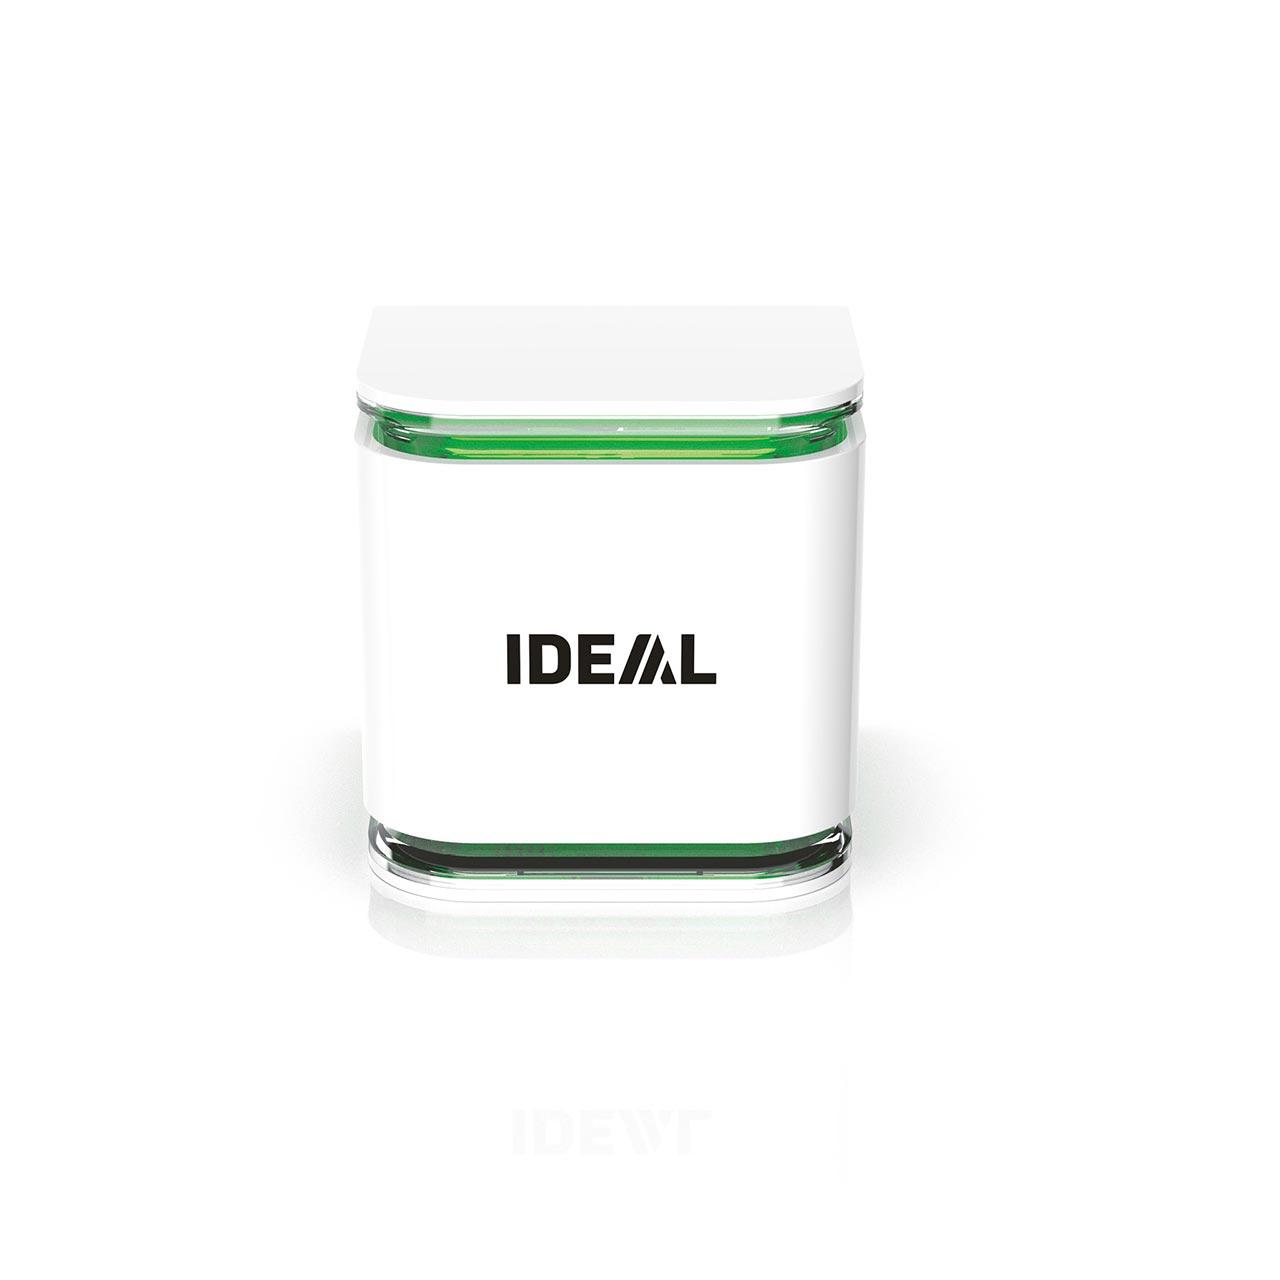 IDEAL AS10 Innenraumsensor